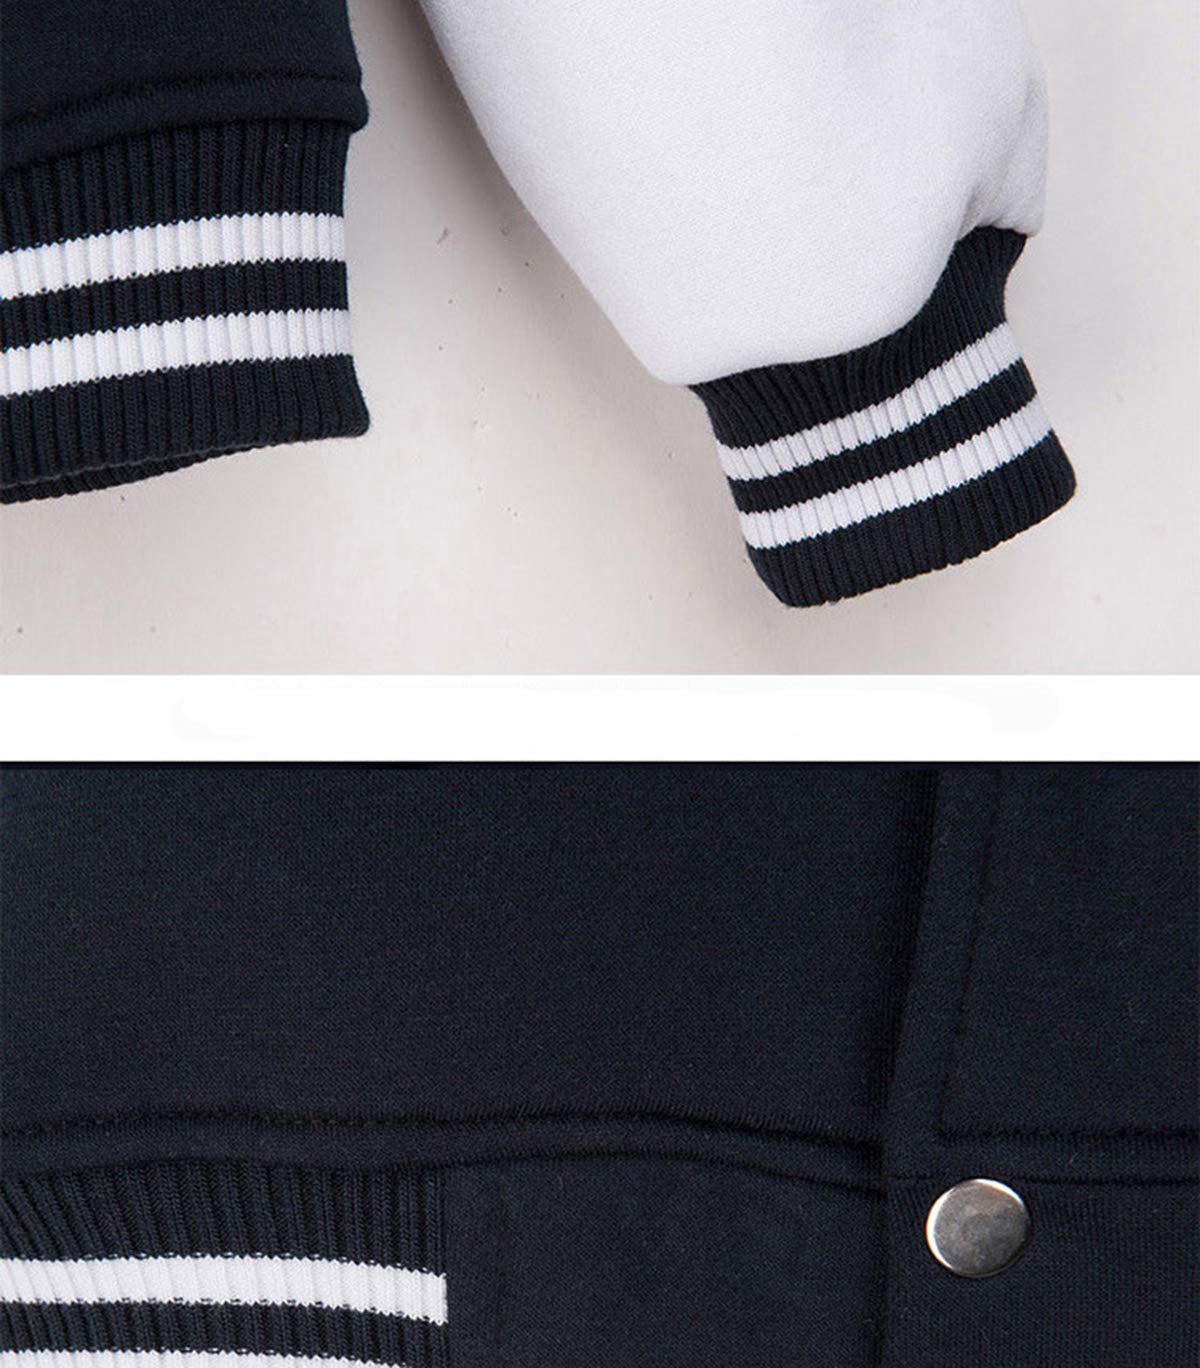 Qaedtls Kpop Monsta X Baseball Jacket Uniform IM Kihyun Shownu Jooheon Hoodie Coat